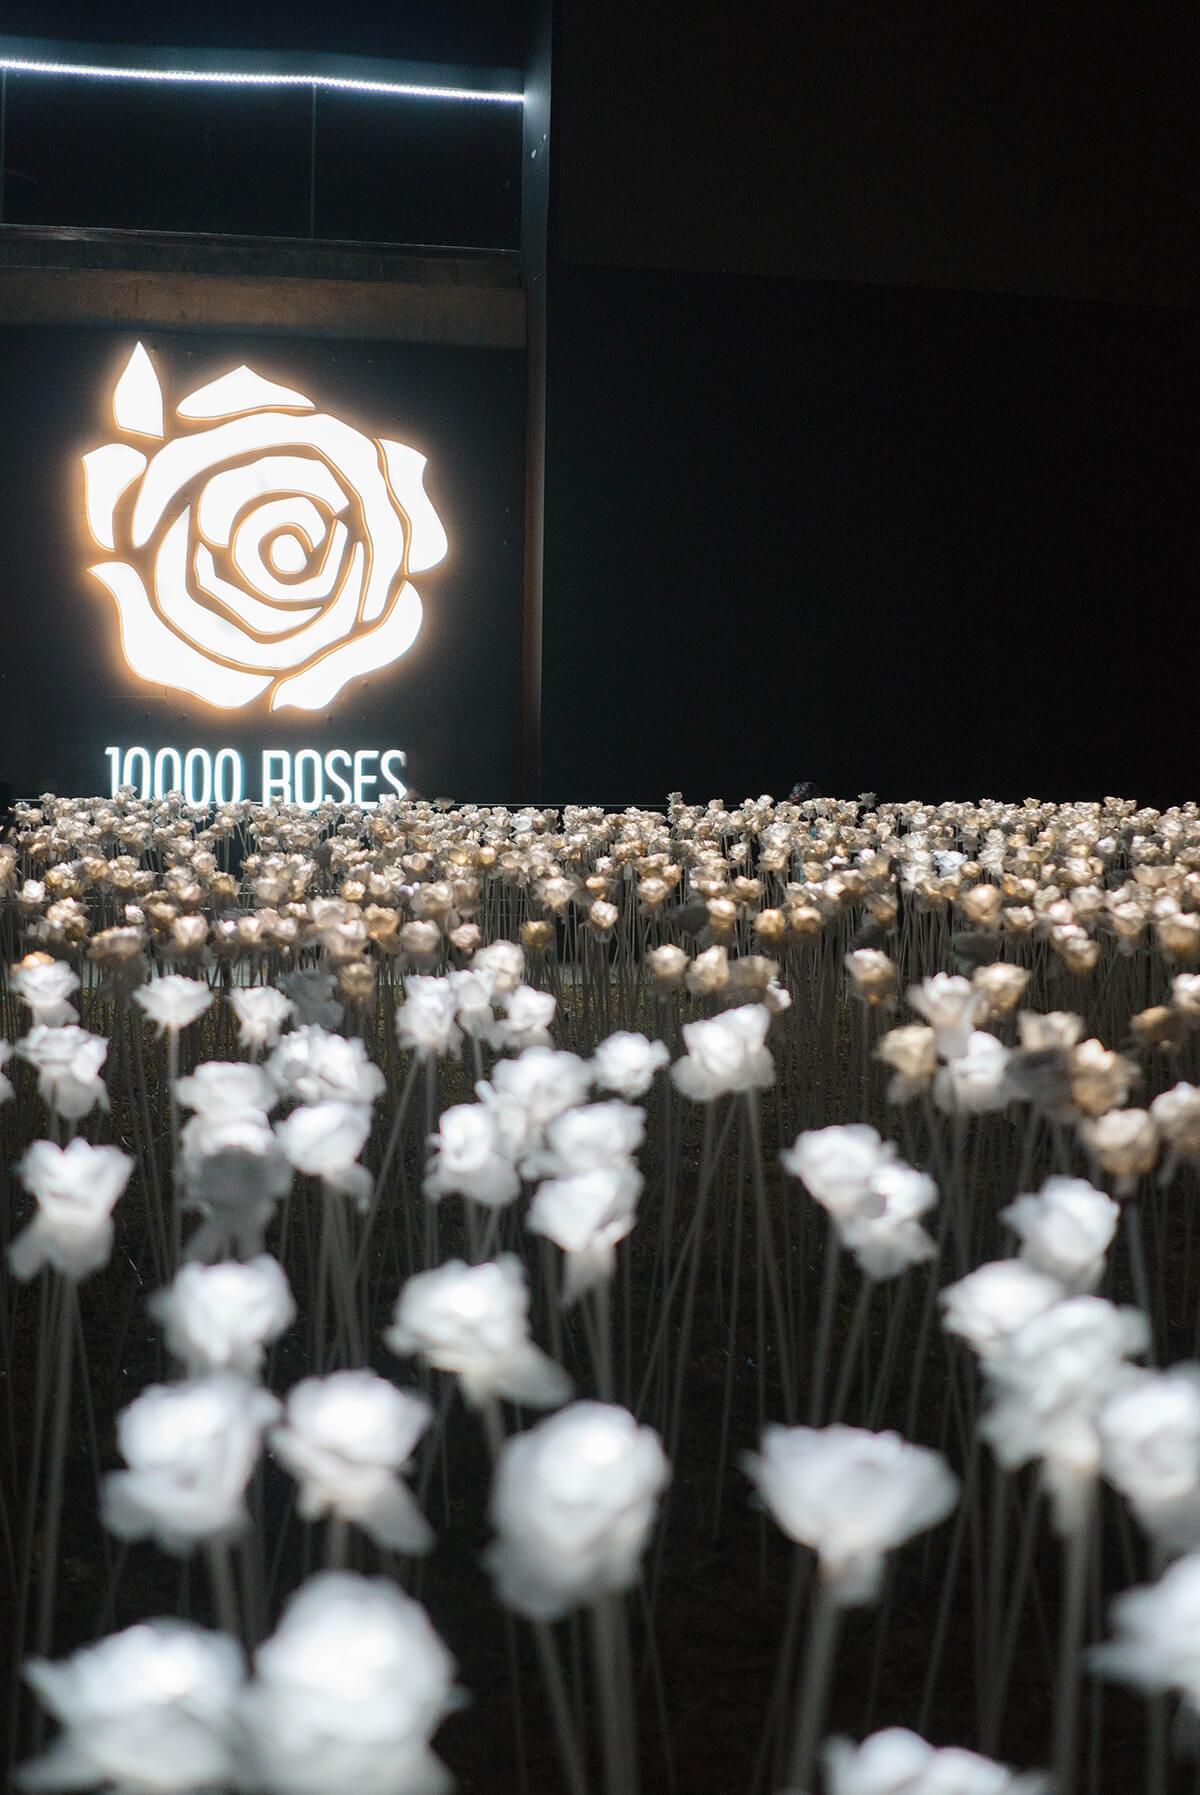 Trice Nagusara Cebu 10000 Roses